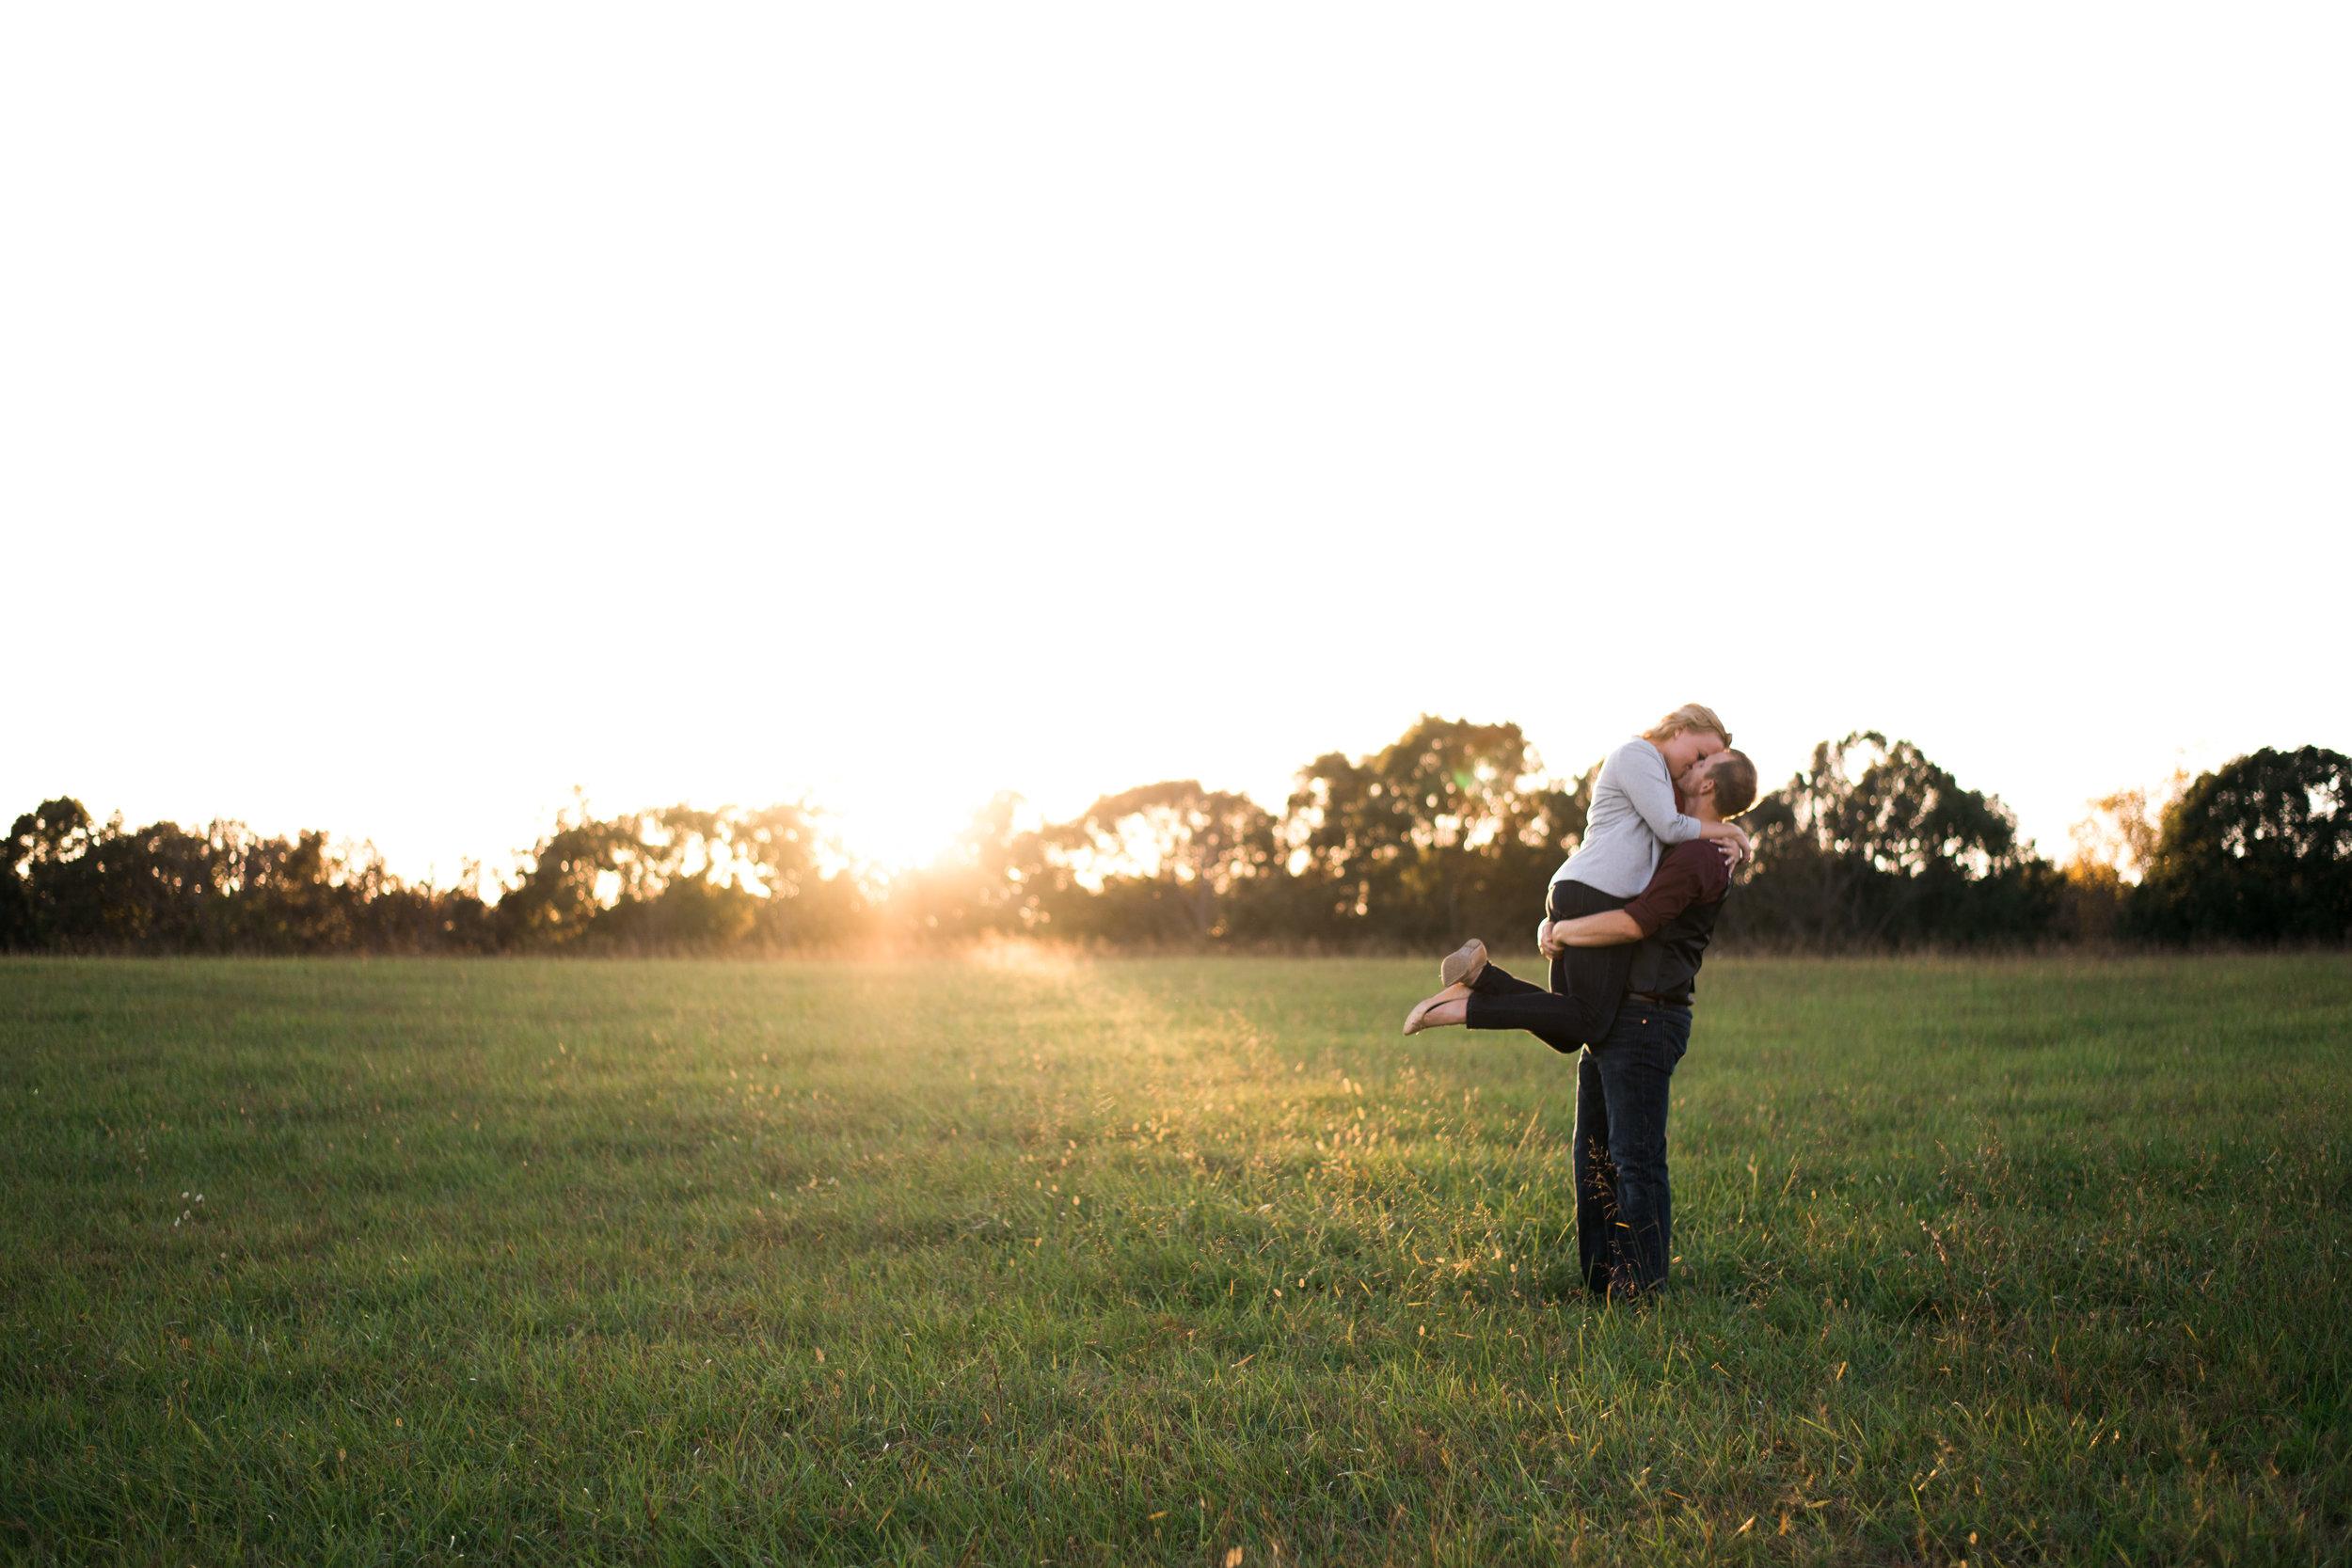 Lynchburg_College_Sorella_Farms_Baseball_Ballet_Virginia_Engagement_Session_Wedding_Photographers (75).jpg